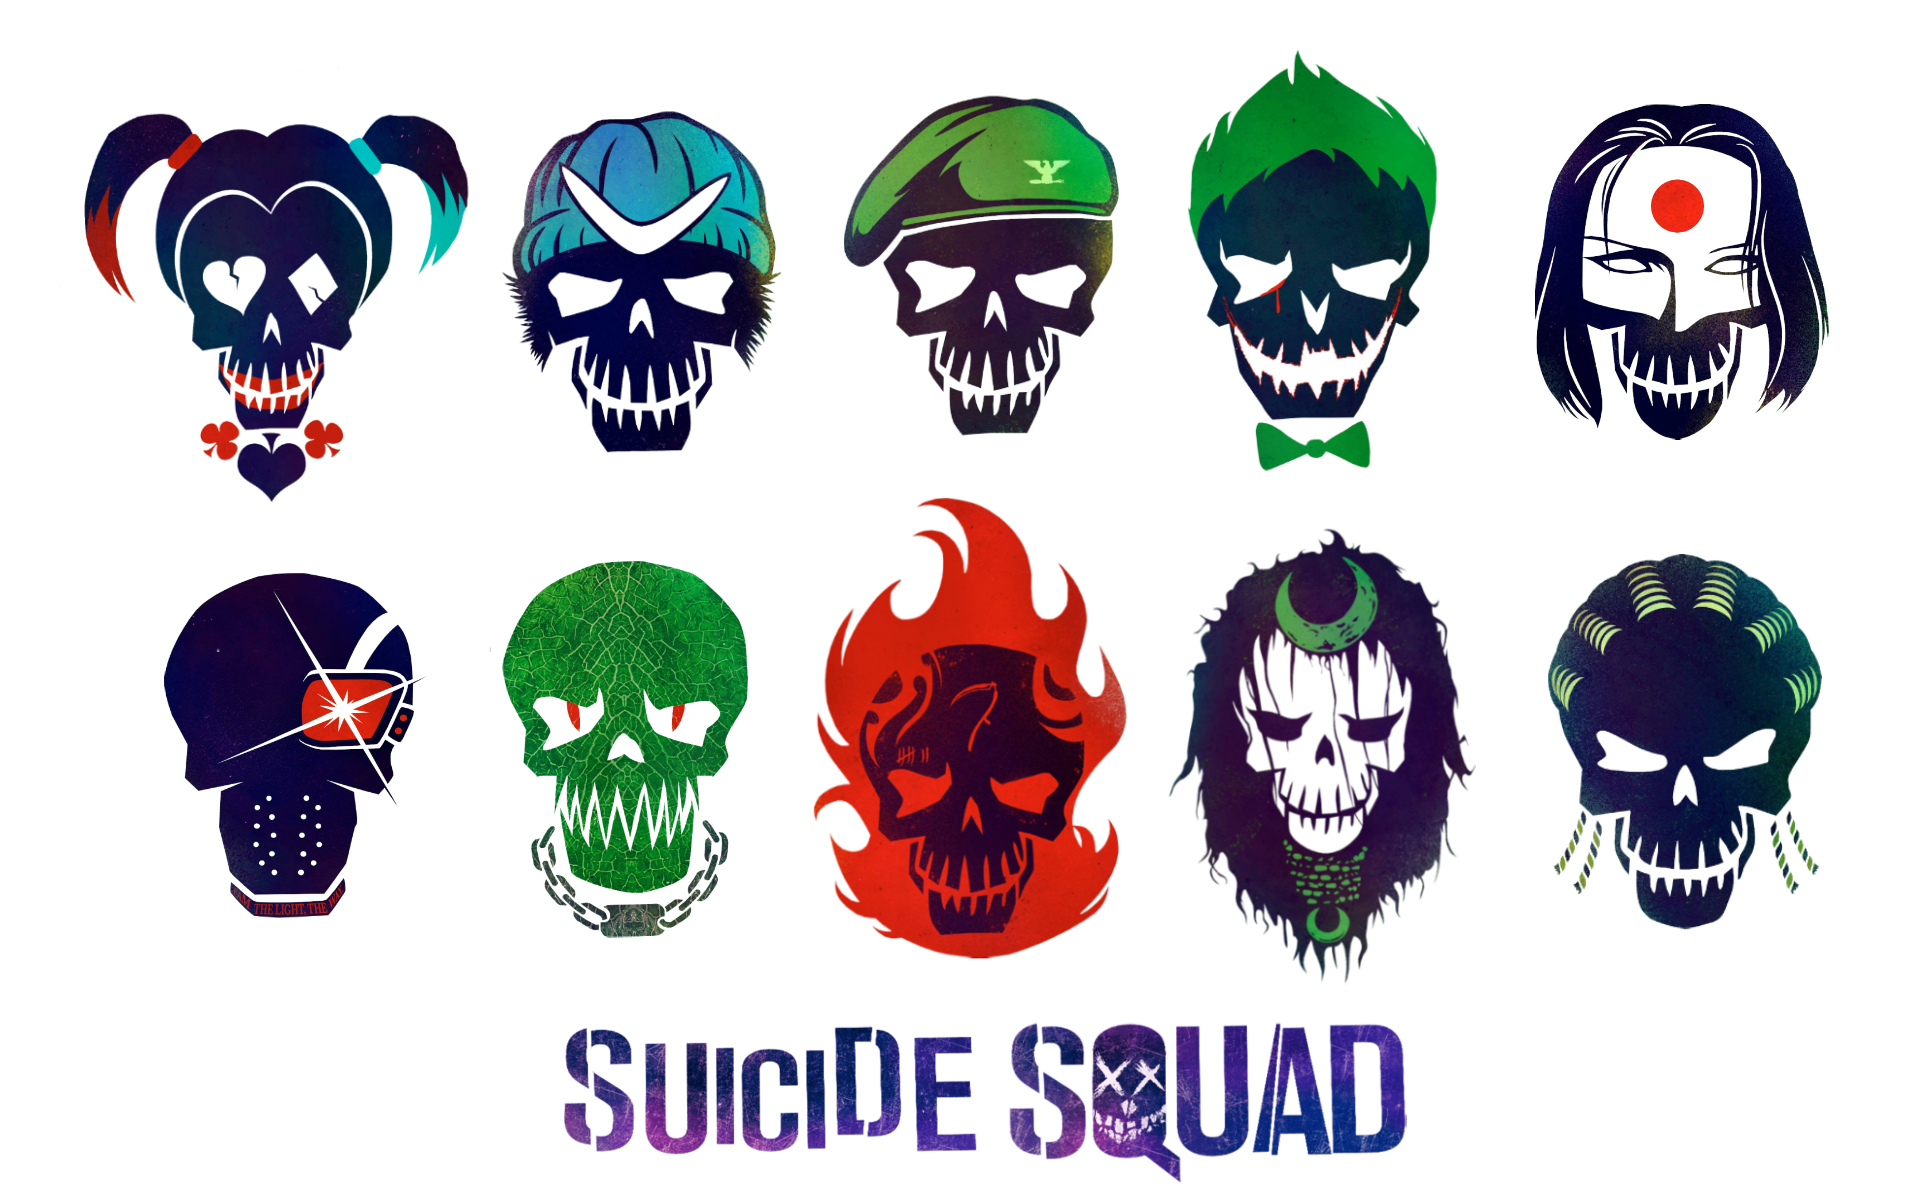 Suicide Squad Transparent By Asthonx1 On Deviantart